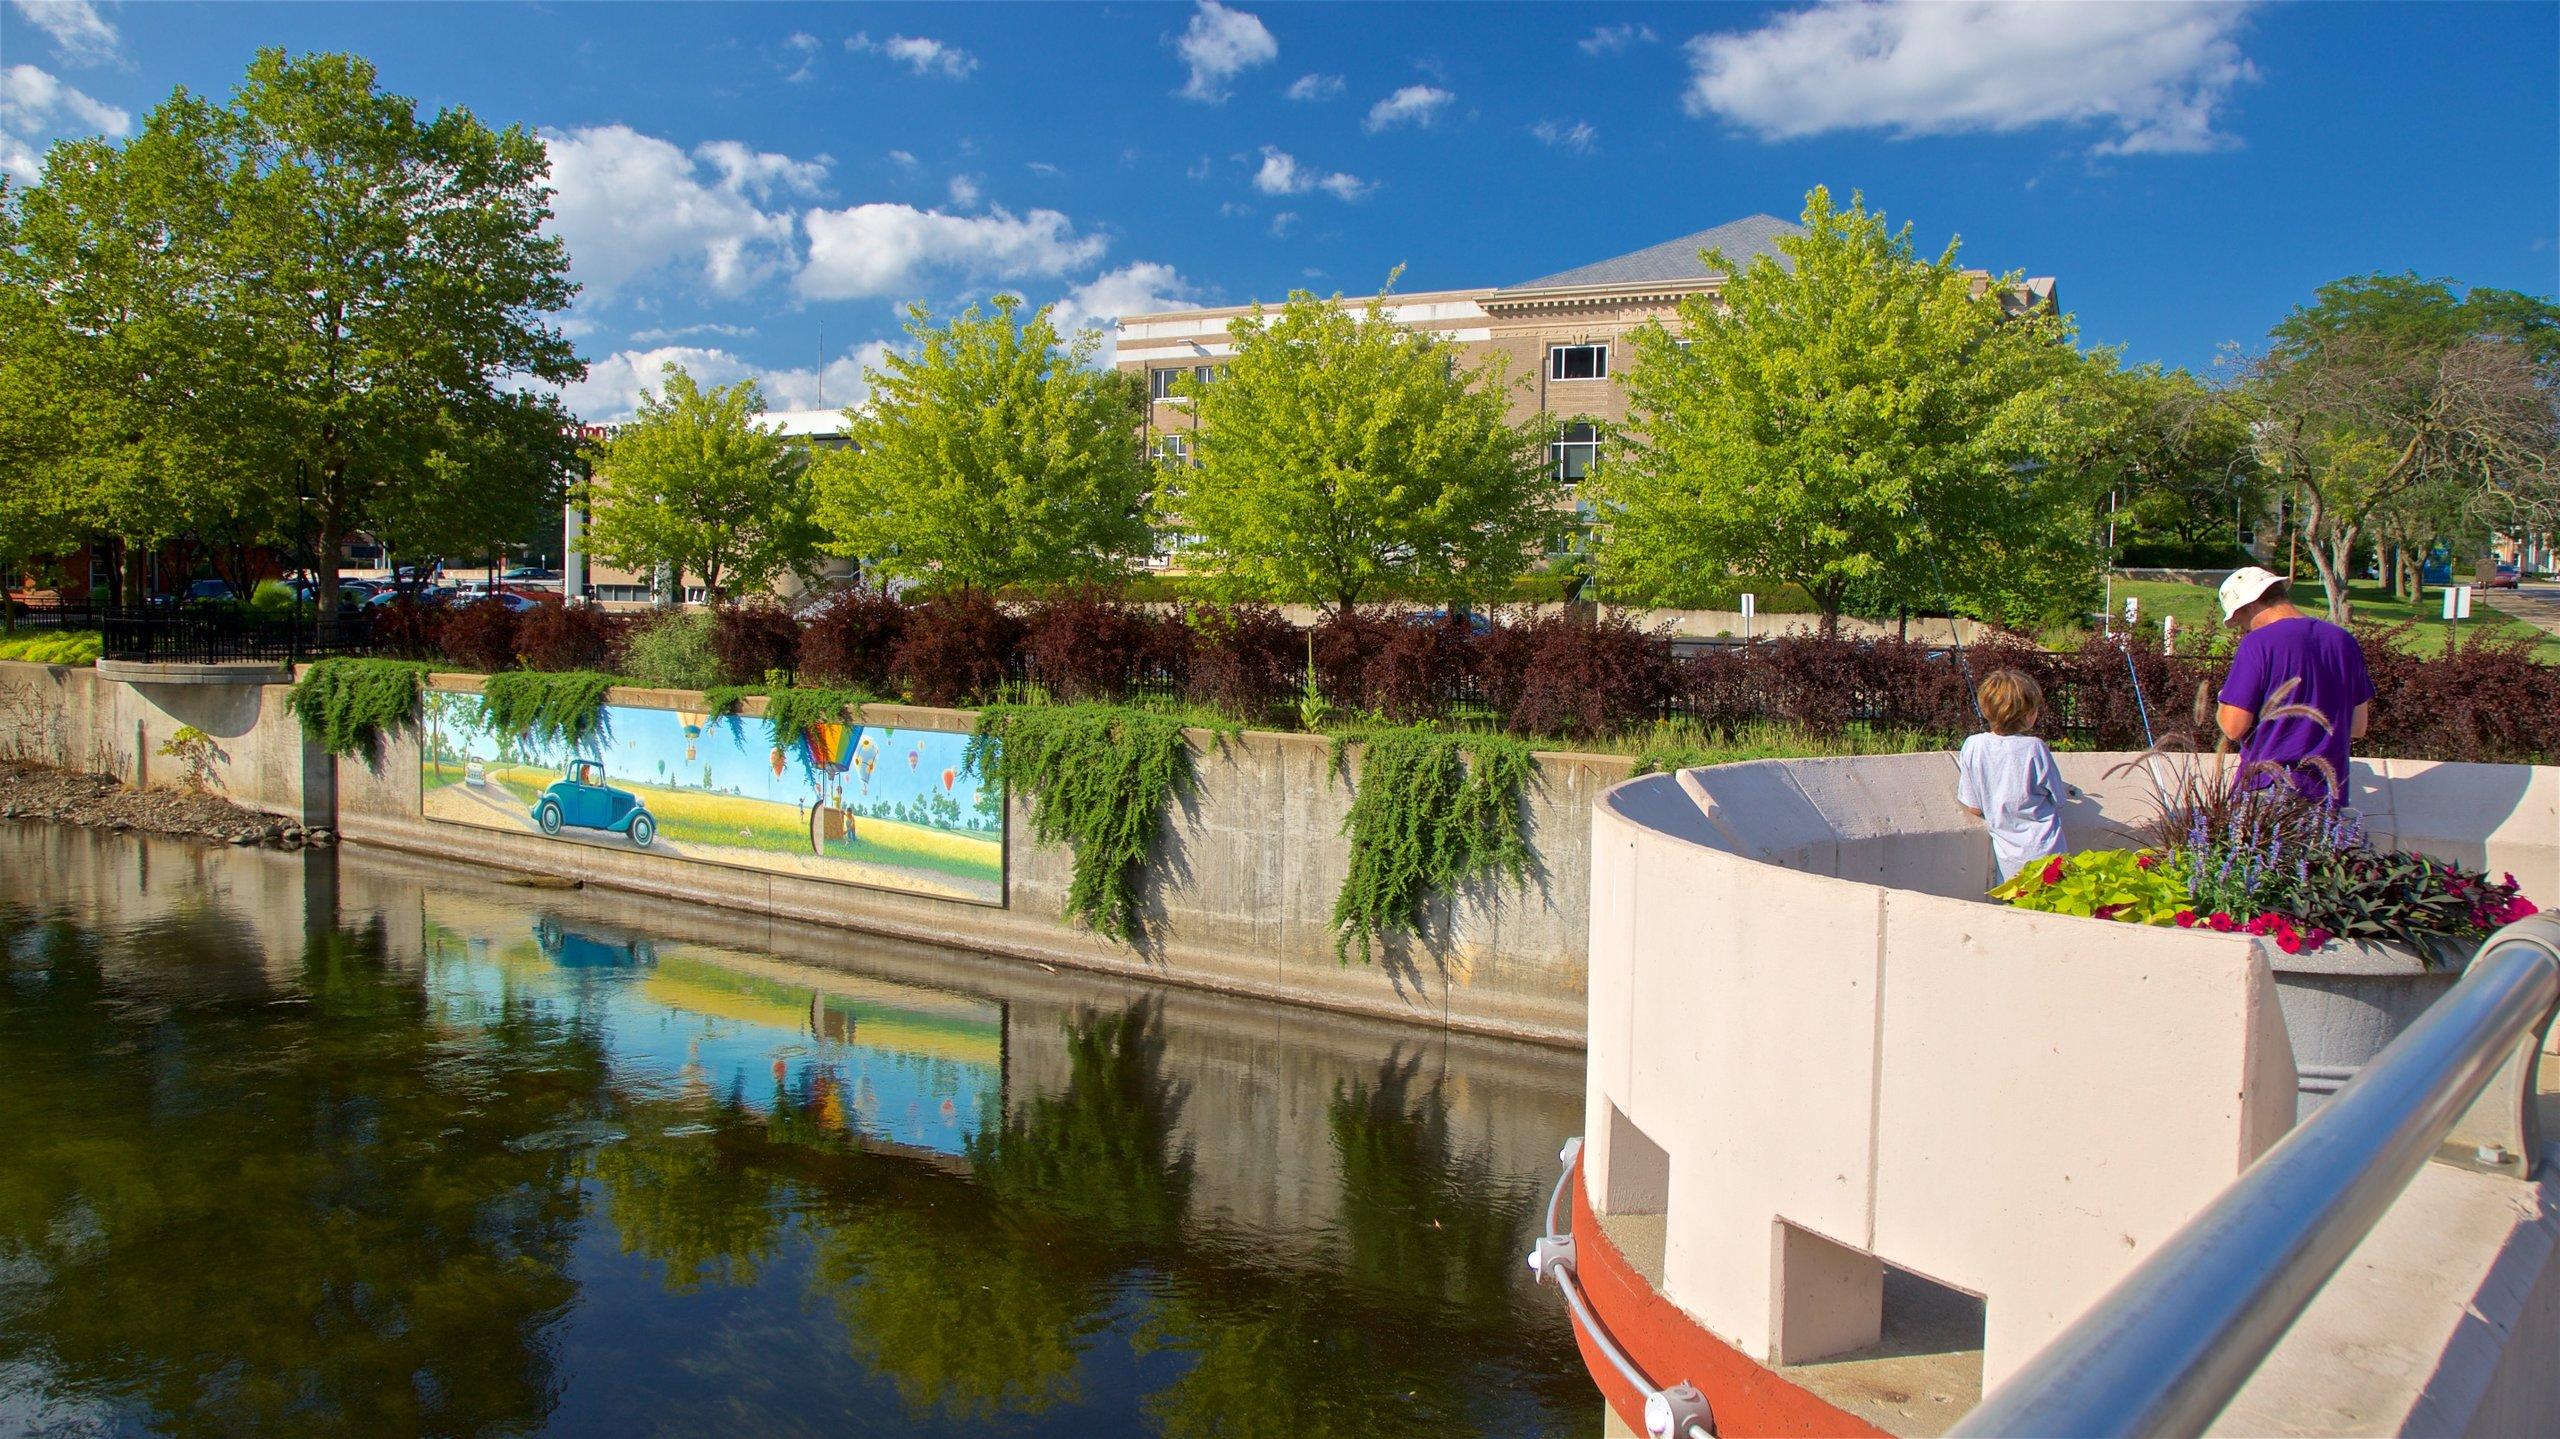 top 10 waterpark hotels in battle creek mi 129 deals. Black Bedroom Furniture Sets. Home Design Ideas